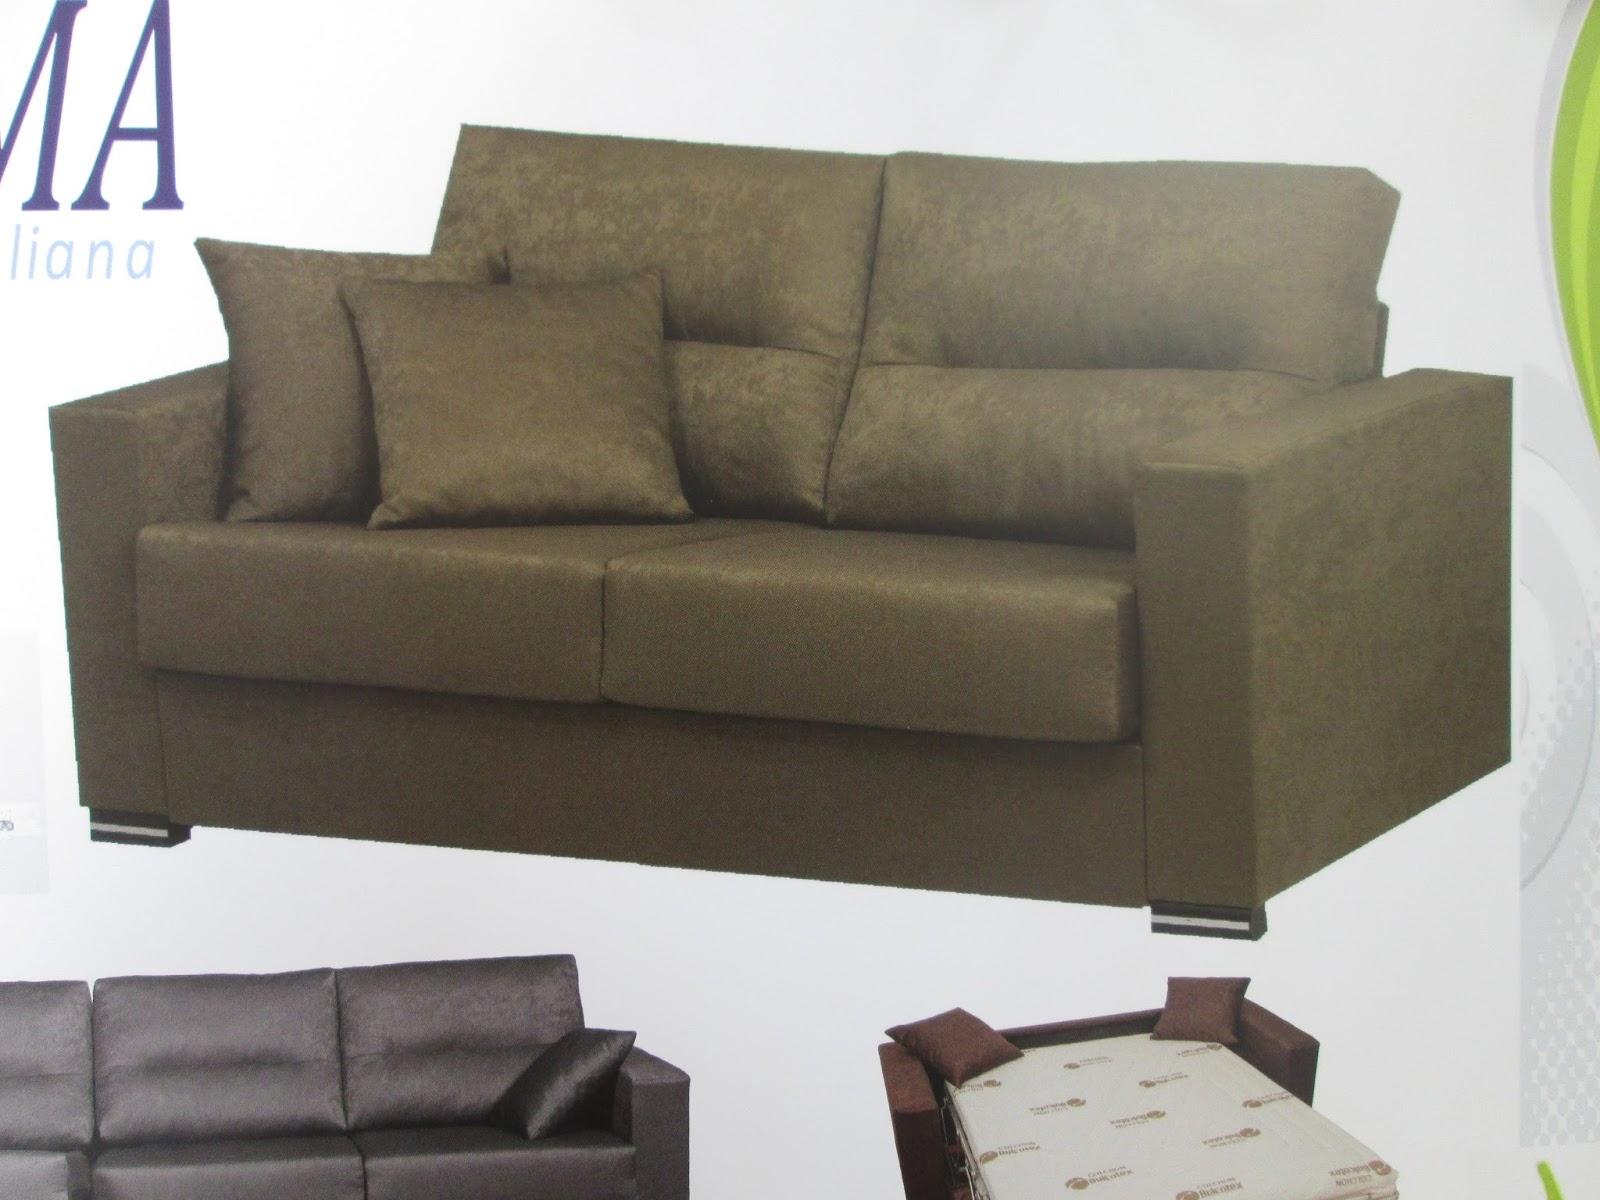 Muebles arcecoll sof cama sistema italiano 572 for Sofa cama sistema italiano